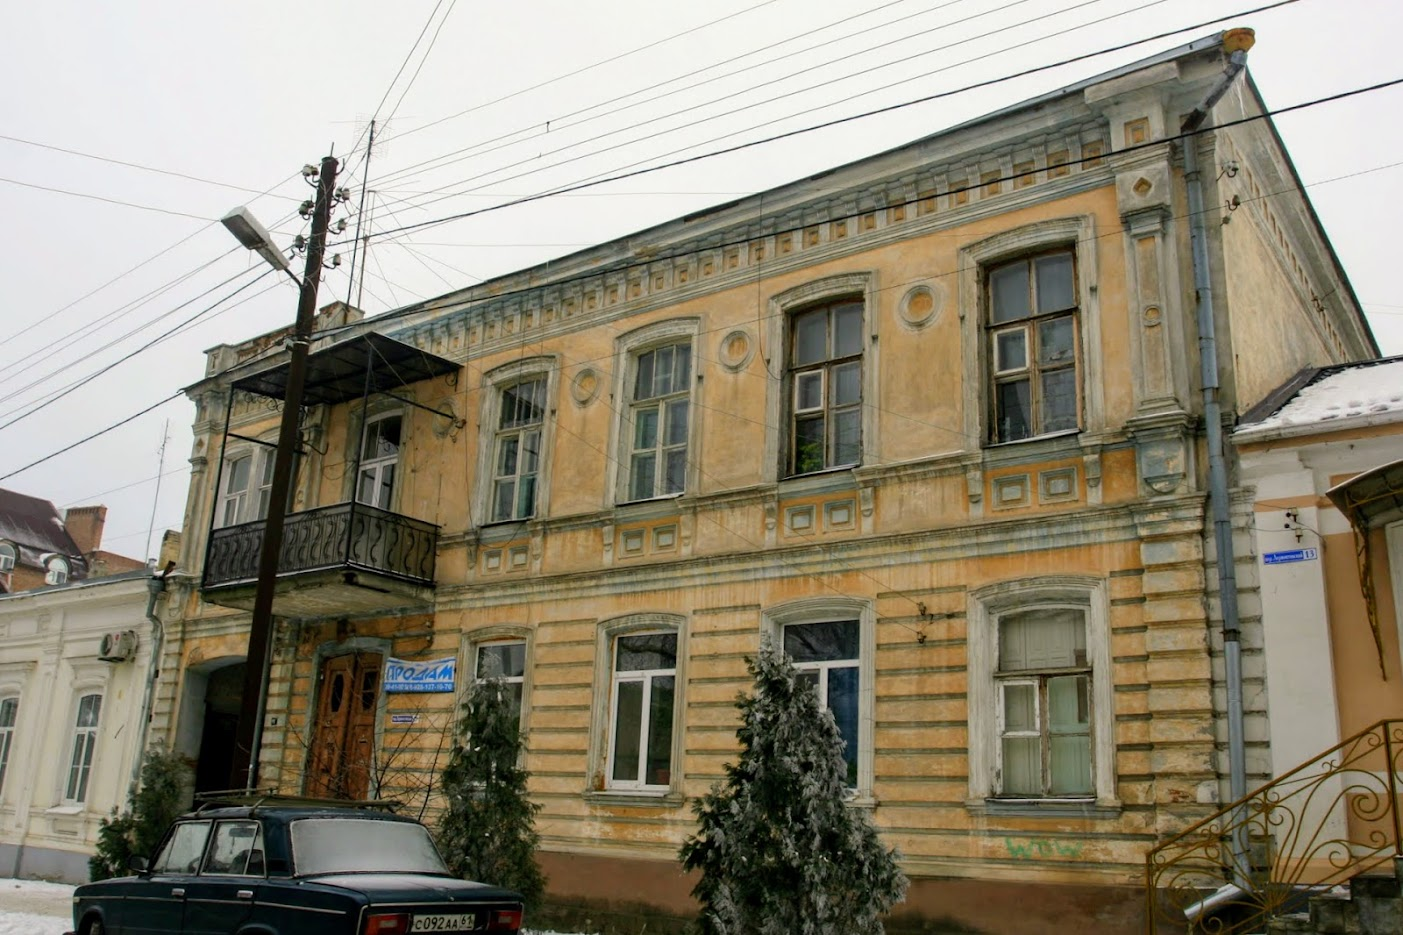 https://sites.google.com/site/istoriceskijtaganrog/lermontovskij-pereulok/dom-11